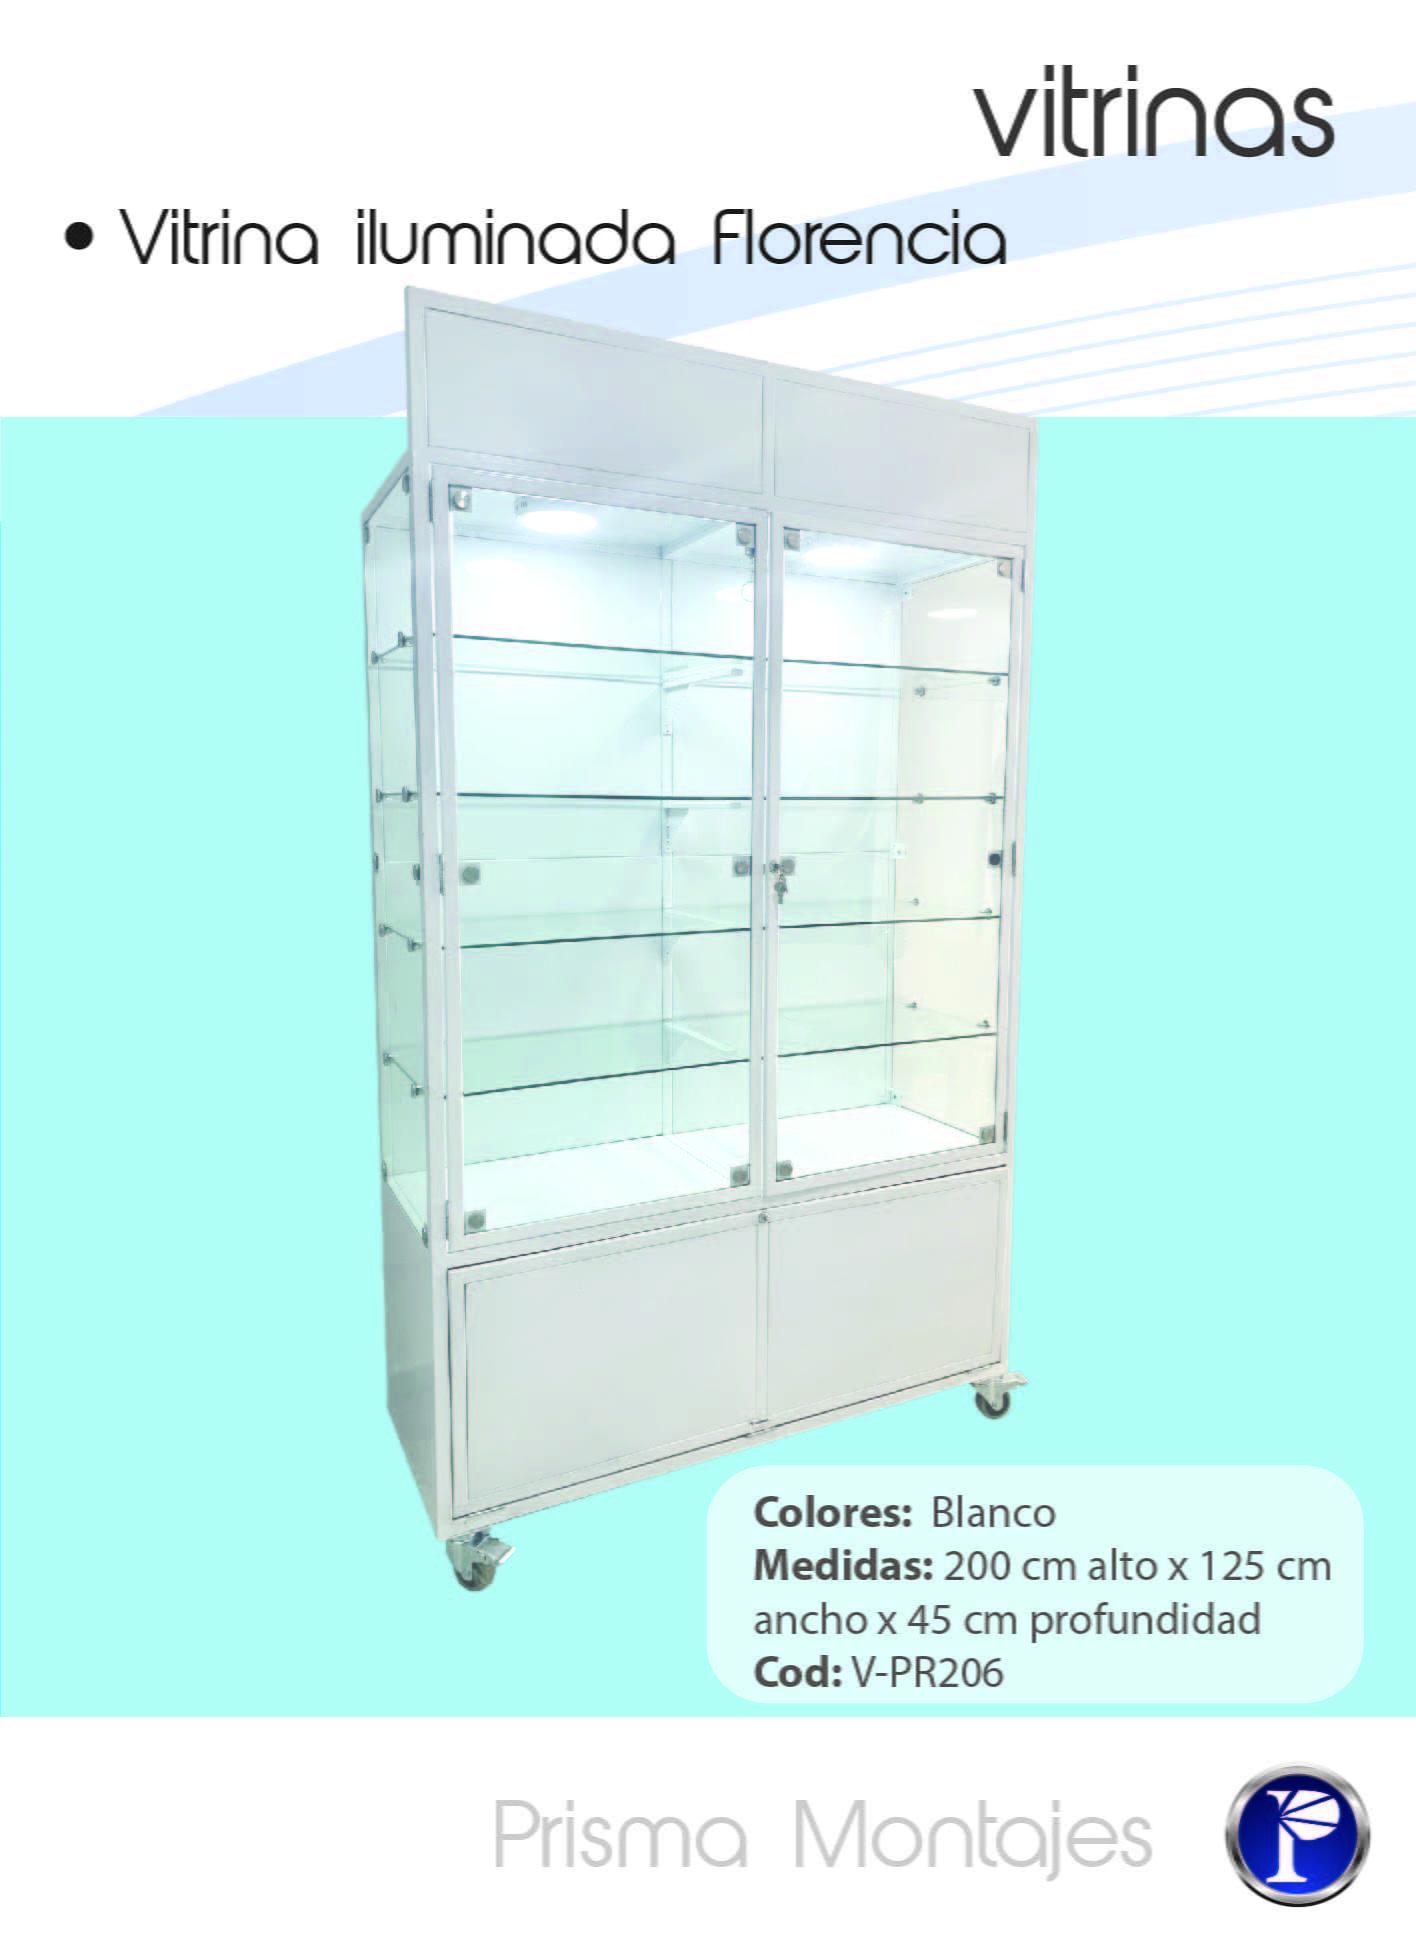 https://prismamontajes.com/producto/vitrina-iluminada-florencia/